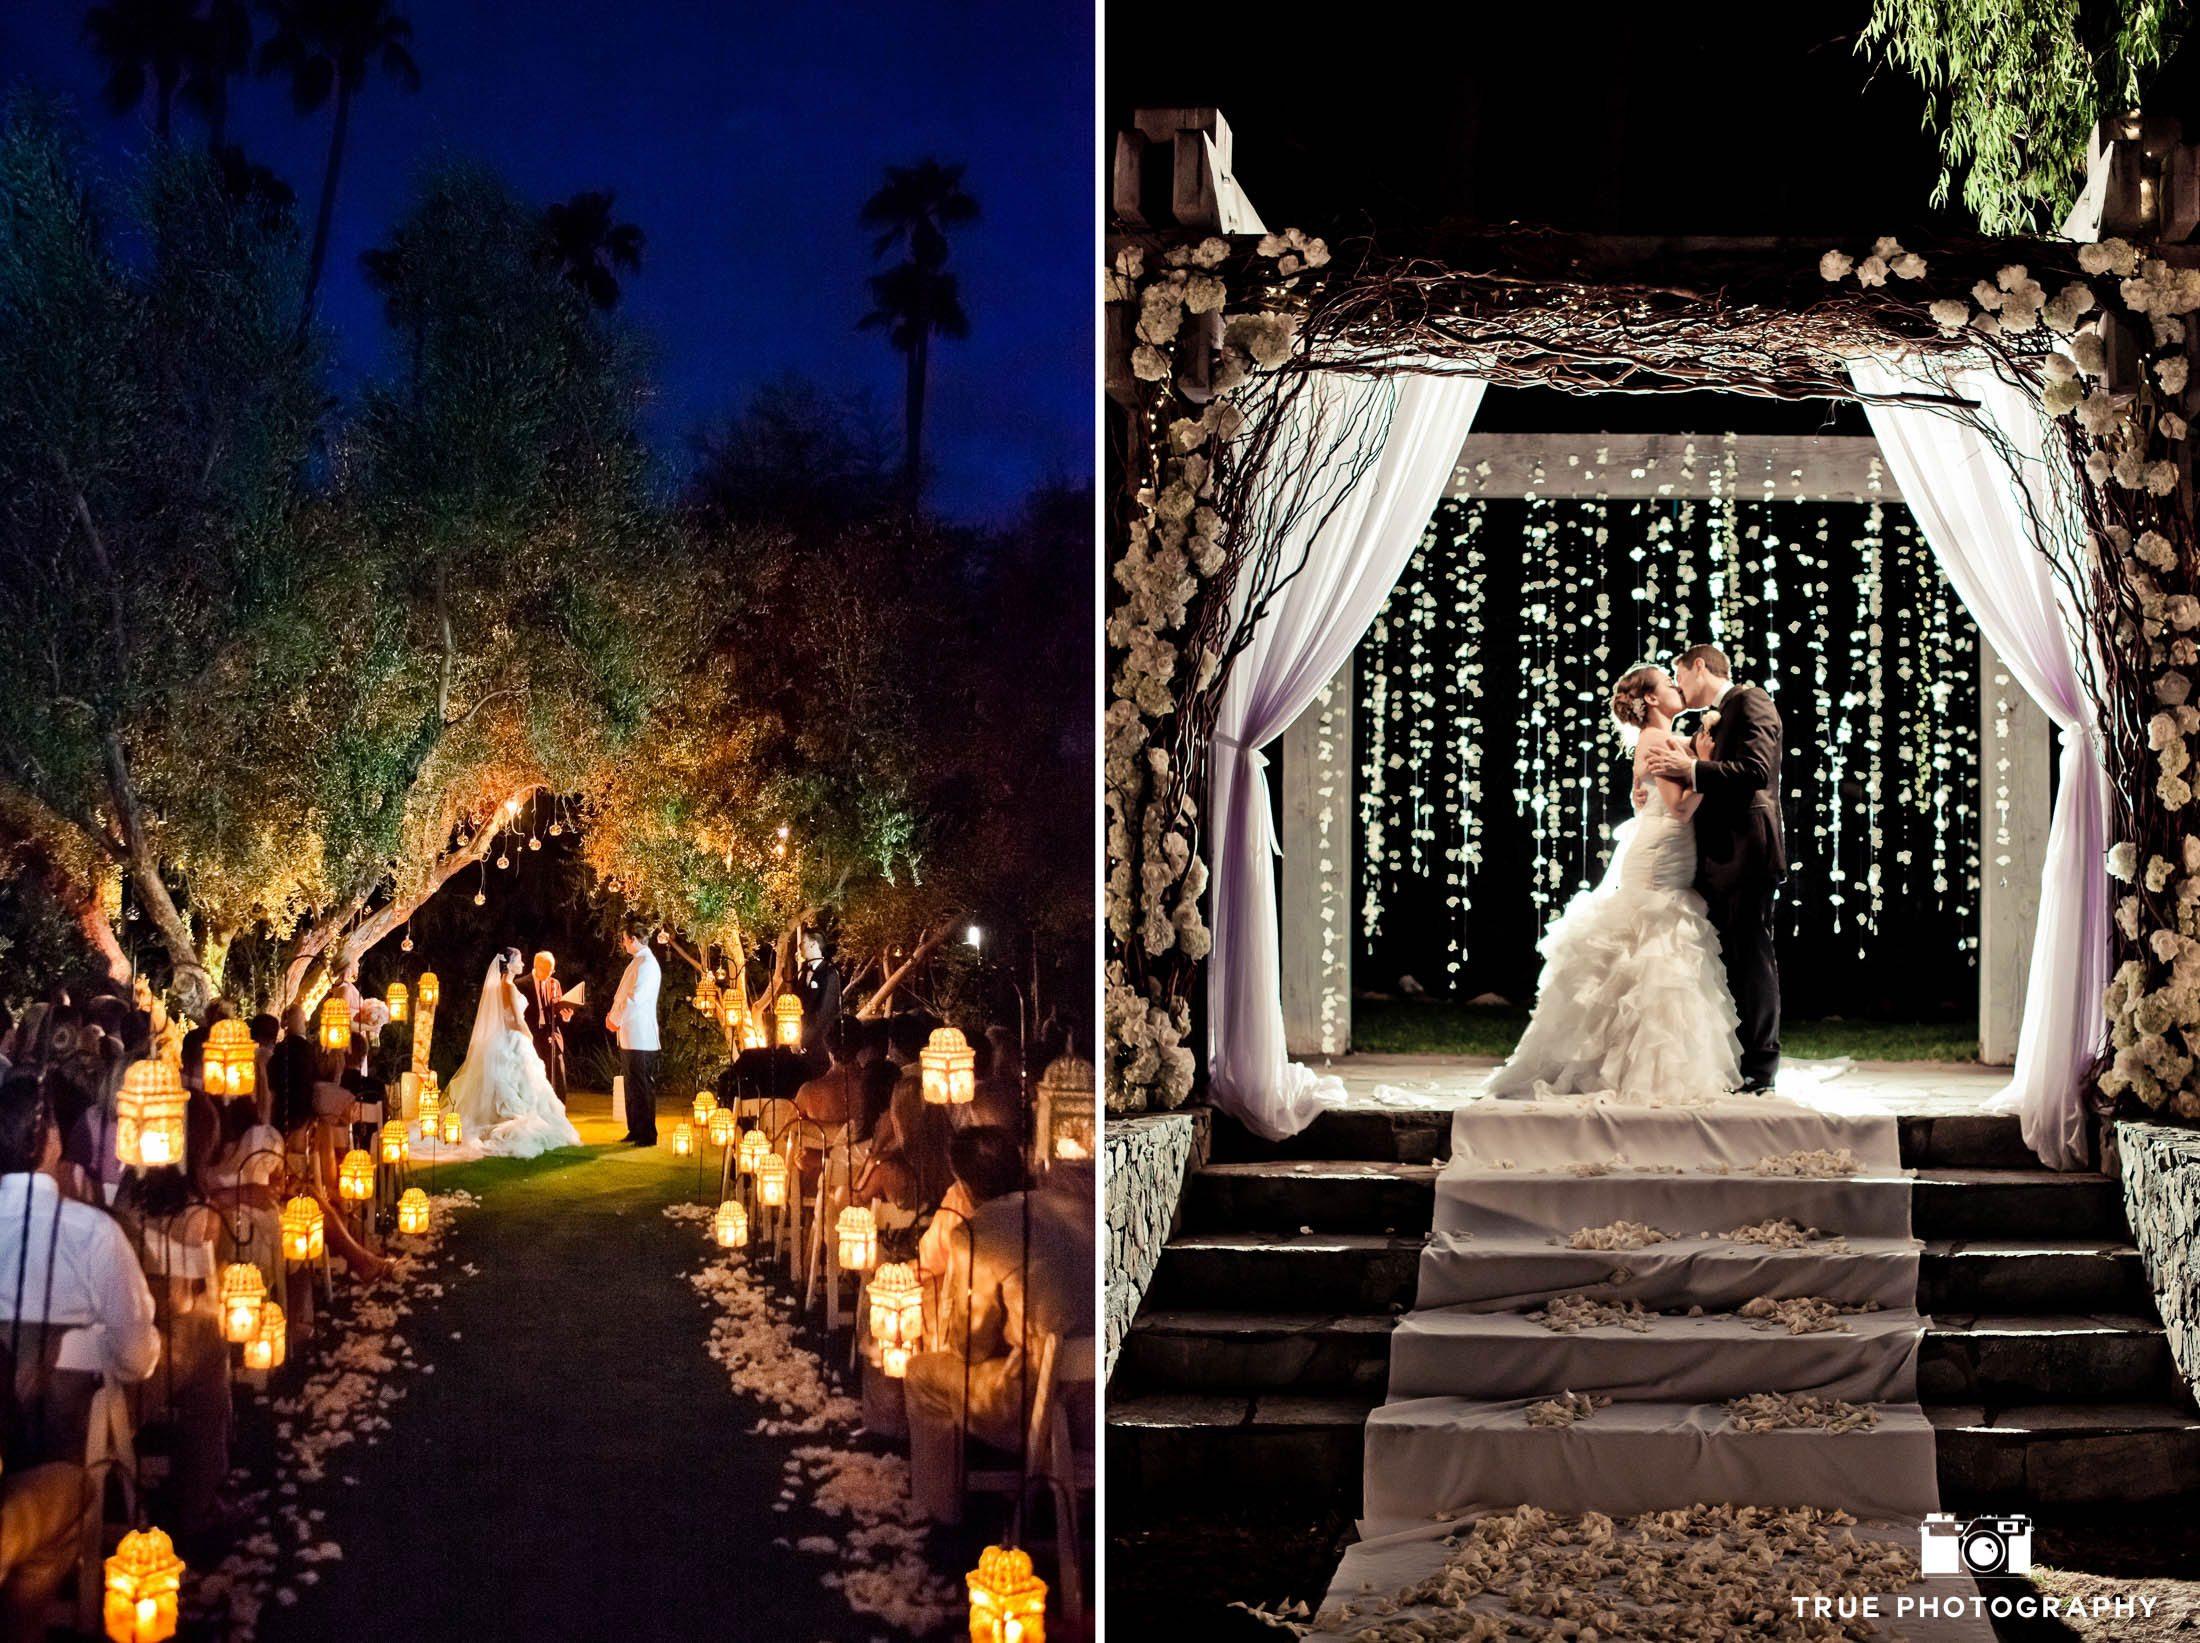 Ceremony night shots of wedding couple